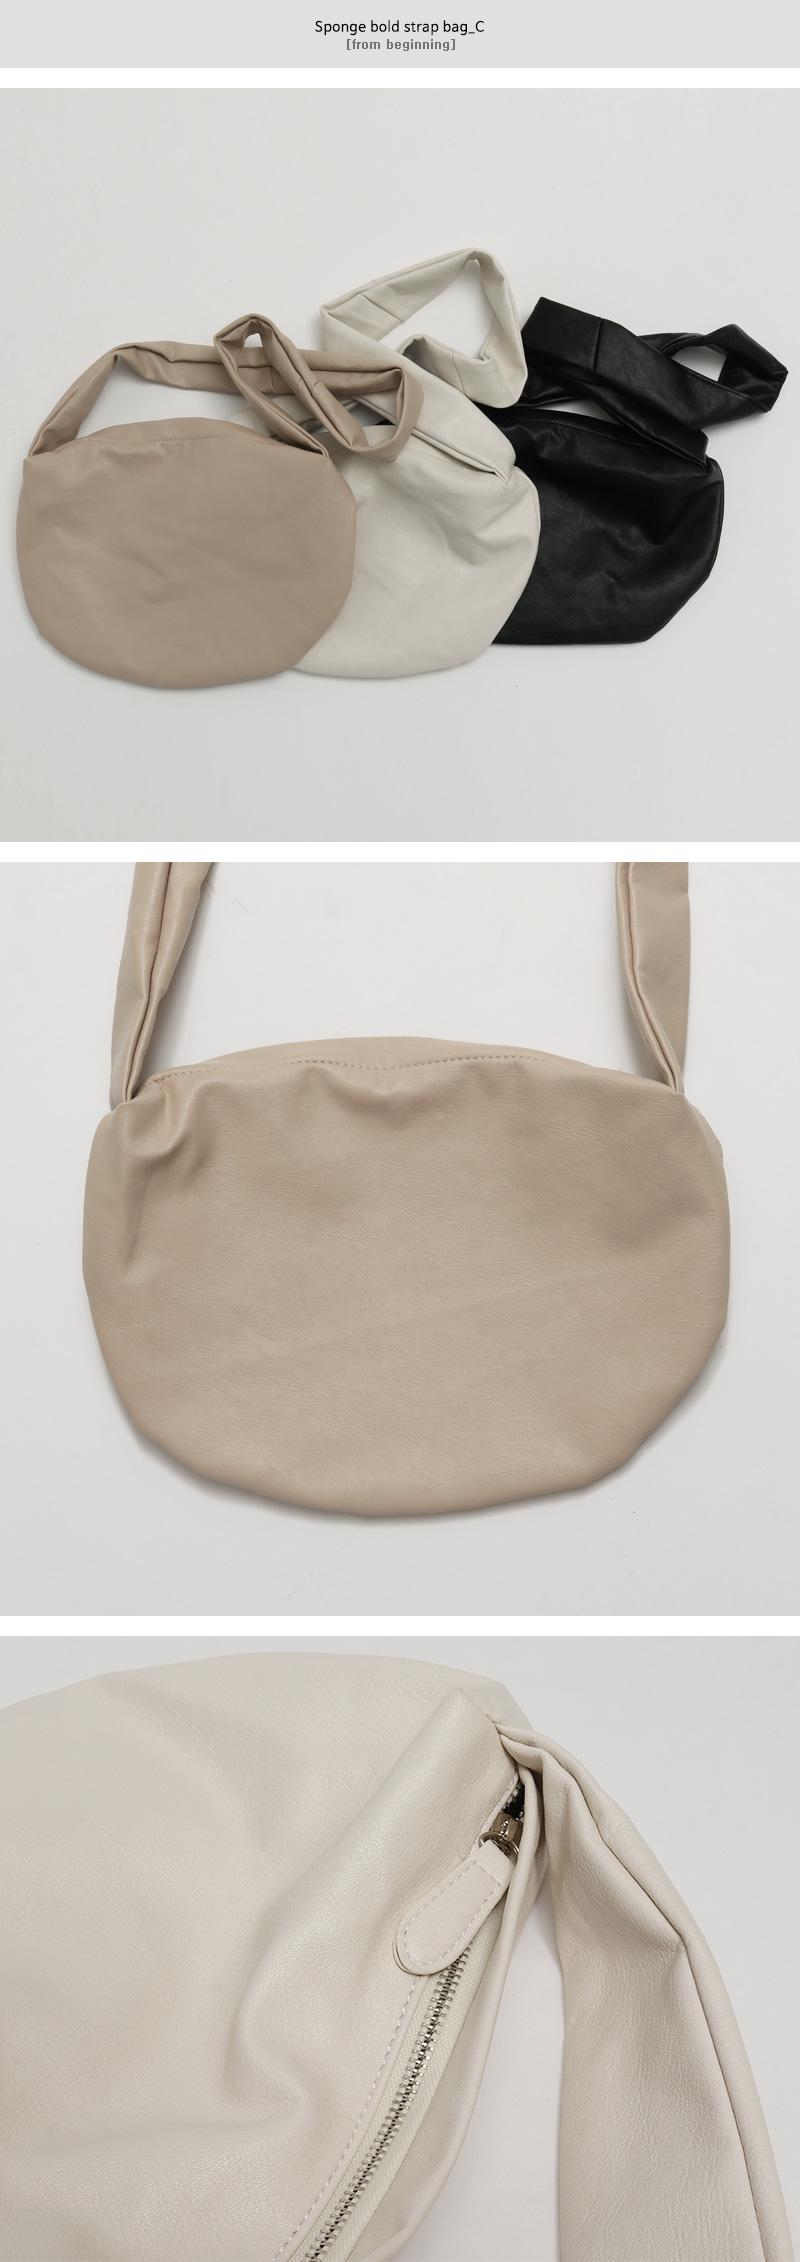 Sponge bold strap bag_C